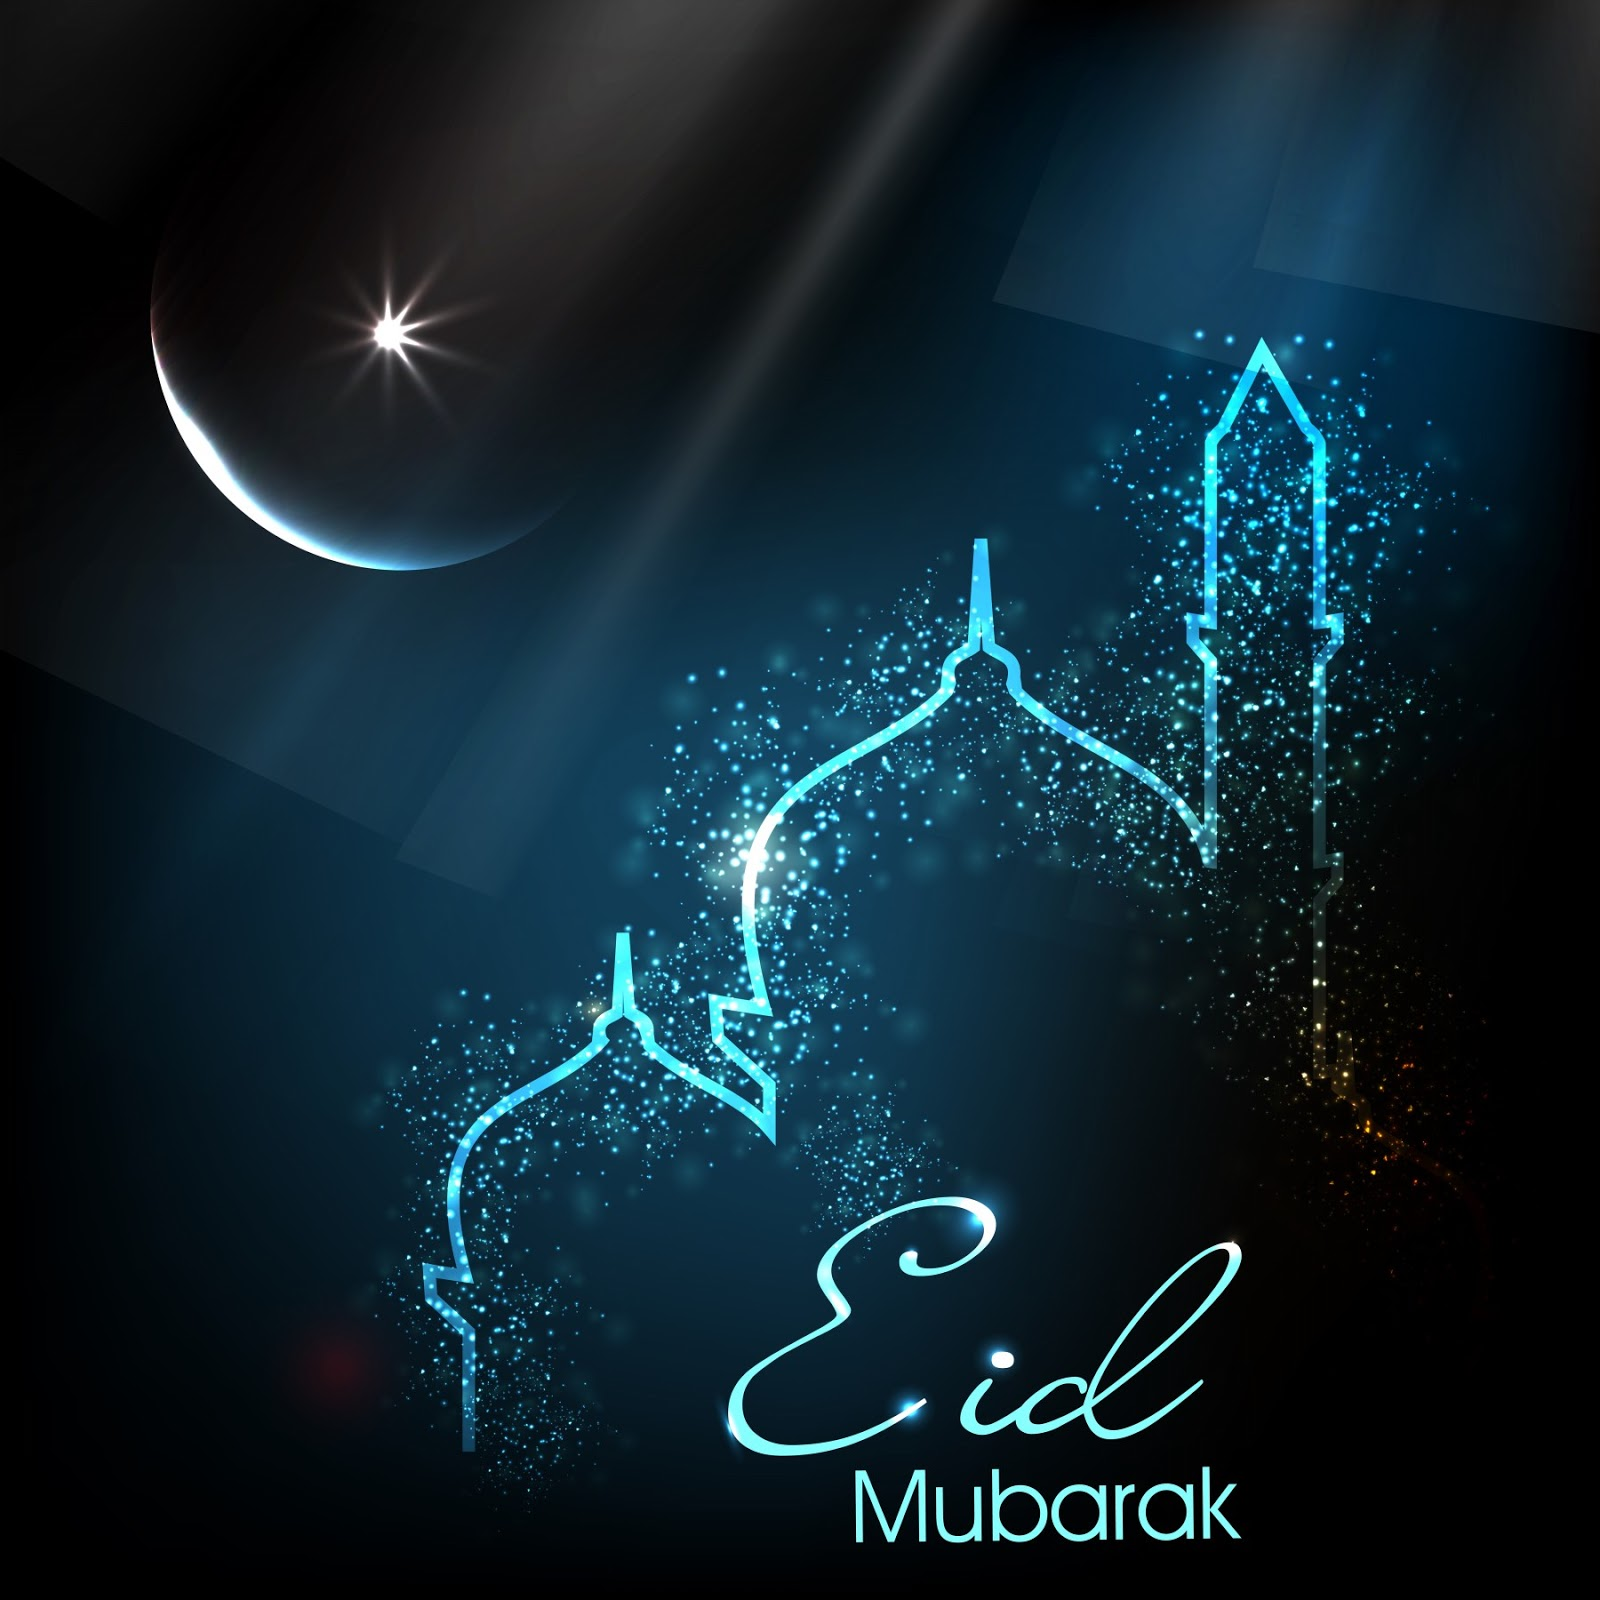 Happy ramadan 2015 messages happy eid al fitr 2015 eid ul fitr happy ramadan 2015 messages kristyandbryce Choice Image